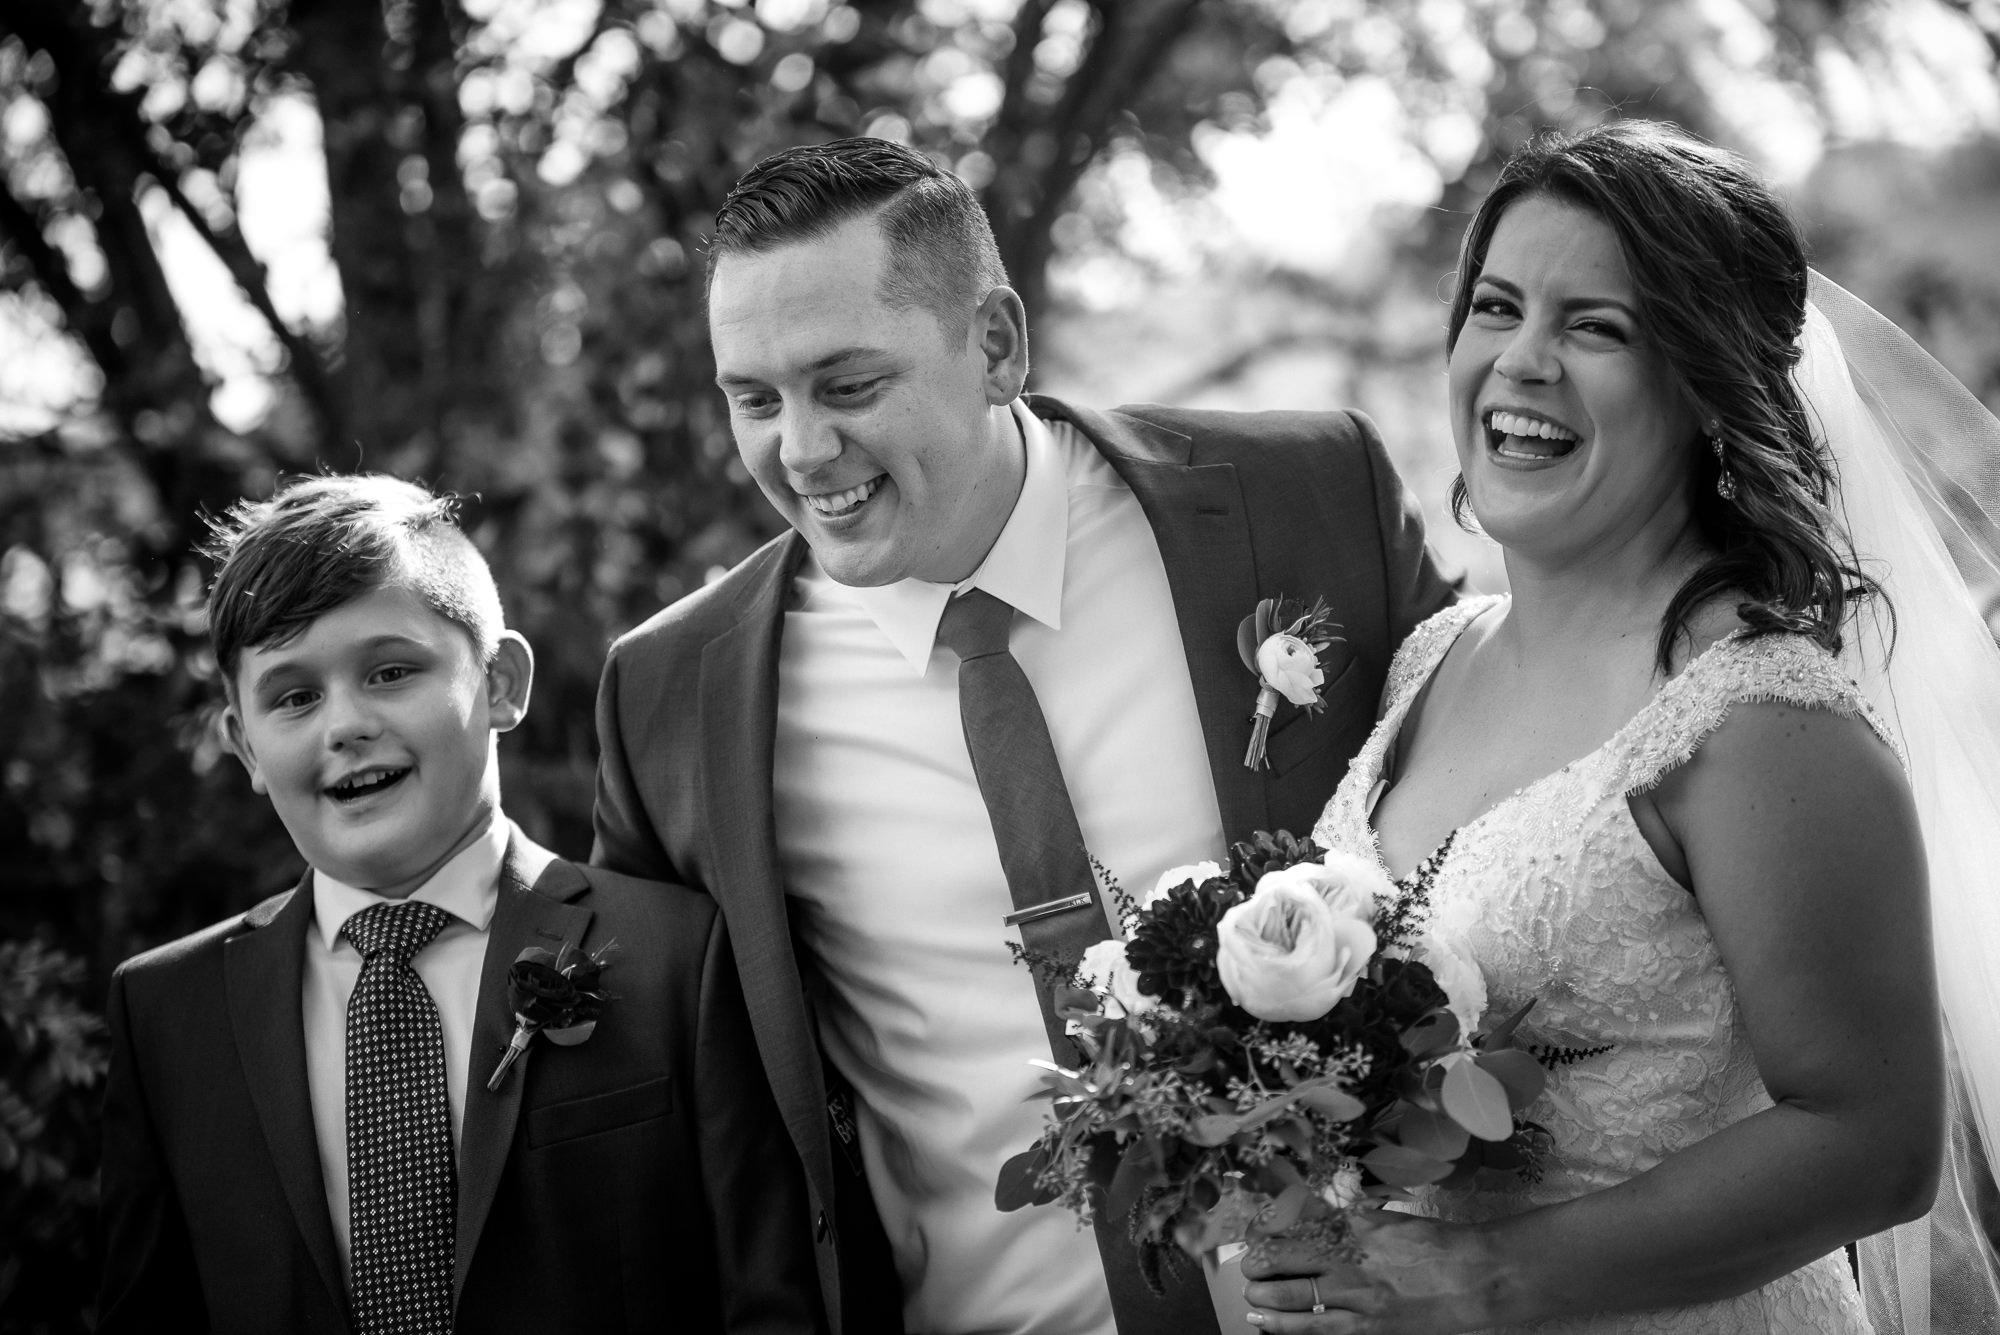 KEVIN-STACY-NOAHS-EVENT-VENUE-OMAHA-WEDDING-PHOTOGRAPHER-014.jpg